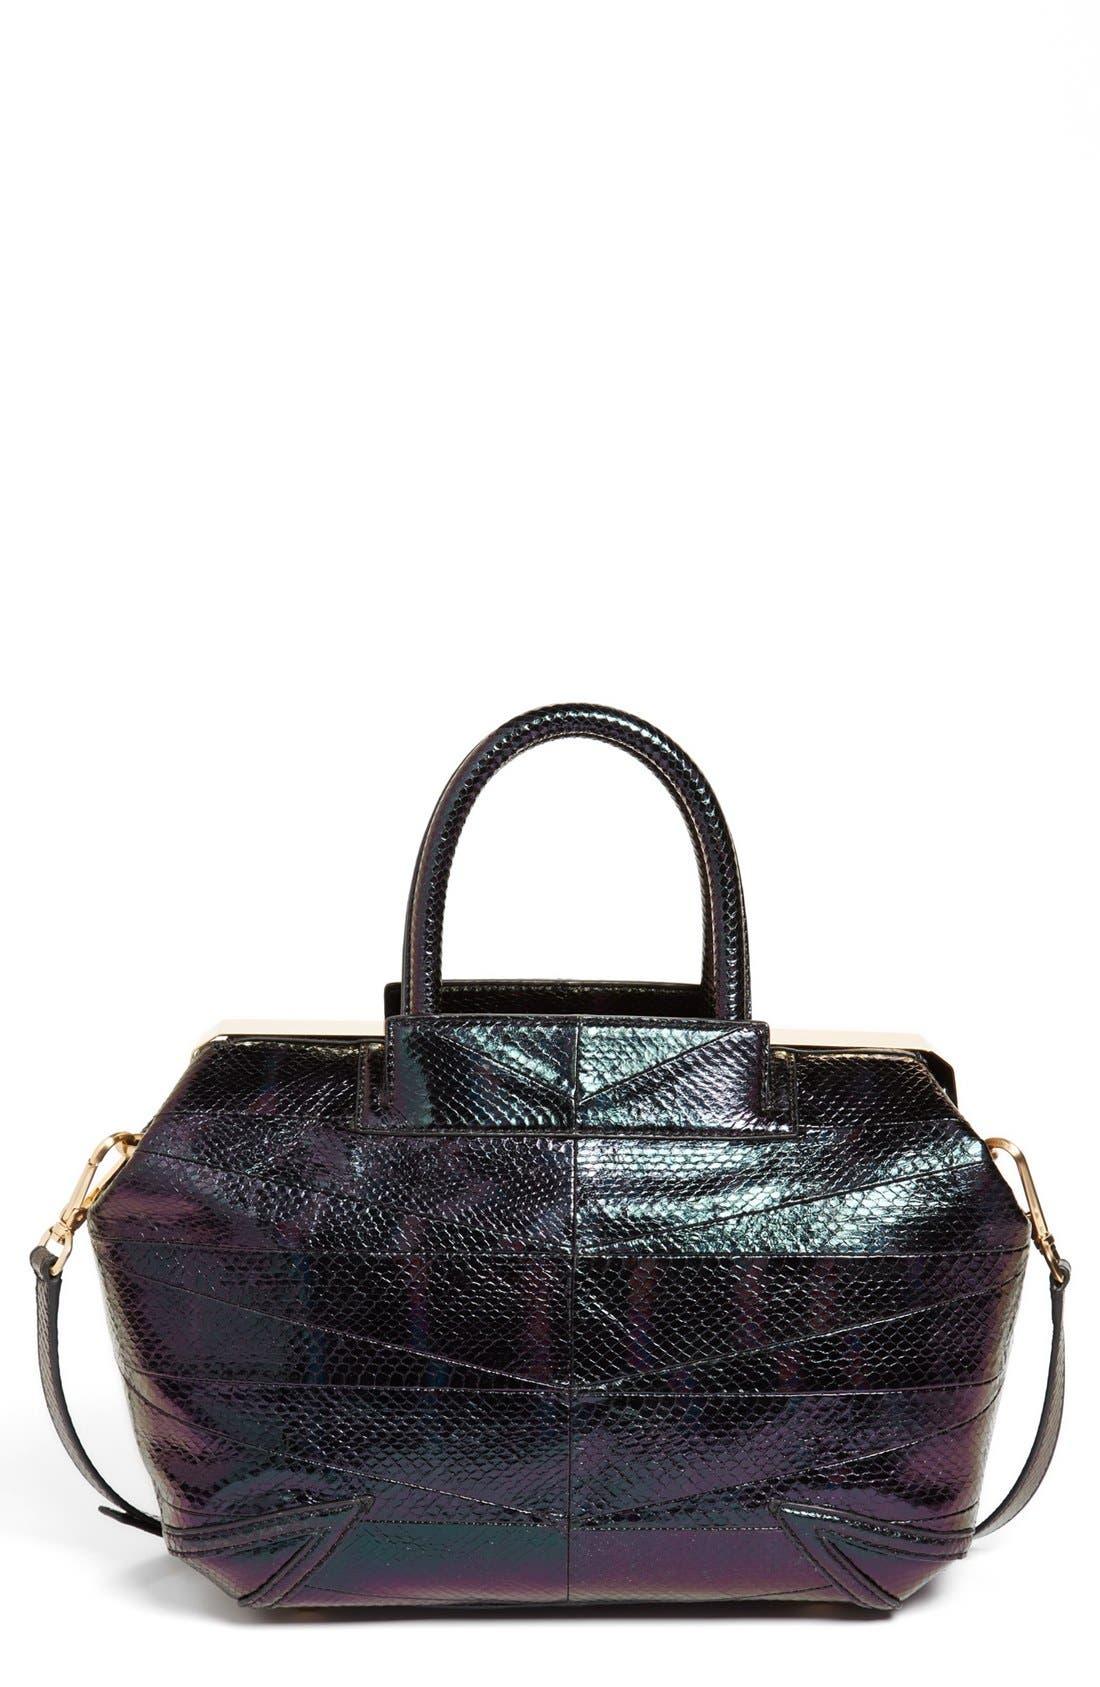 Alternate Image 1 Selected - B Brian Atwood 'Sophia' Leather Satchel, Extra Large